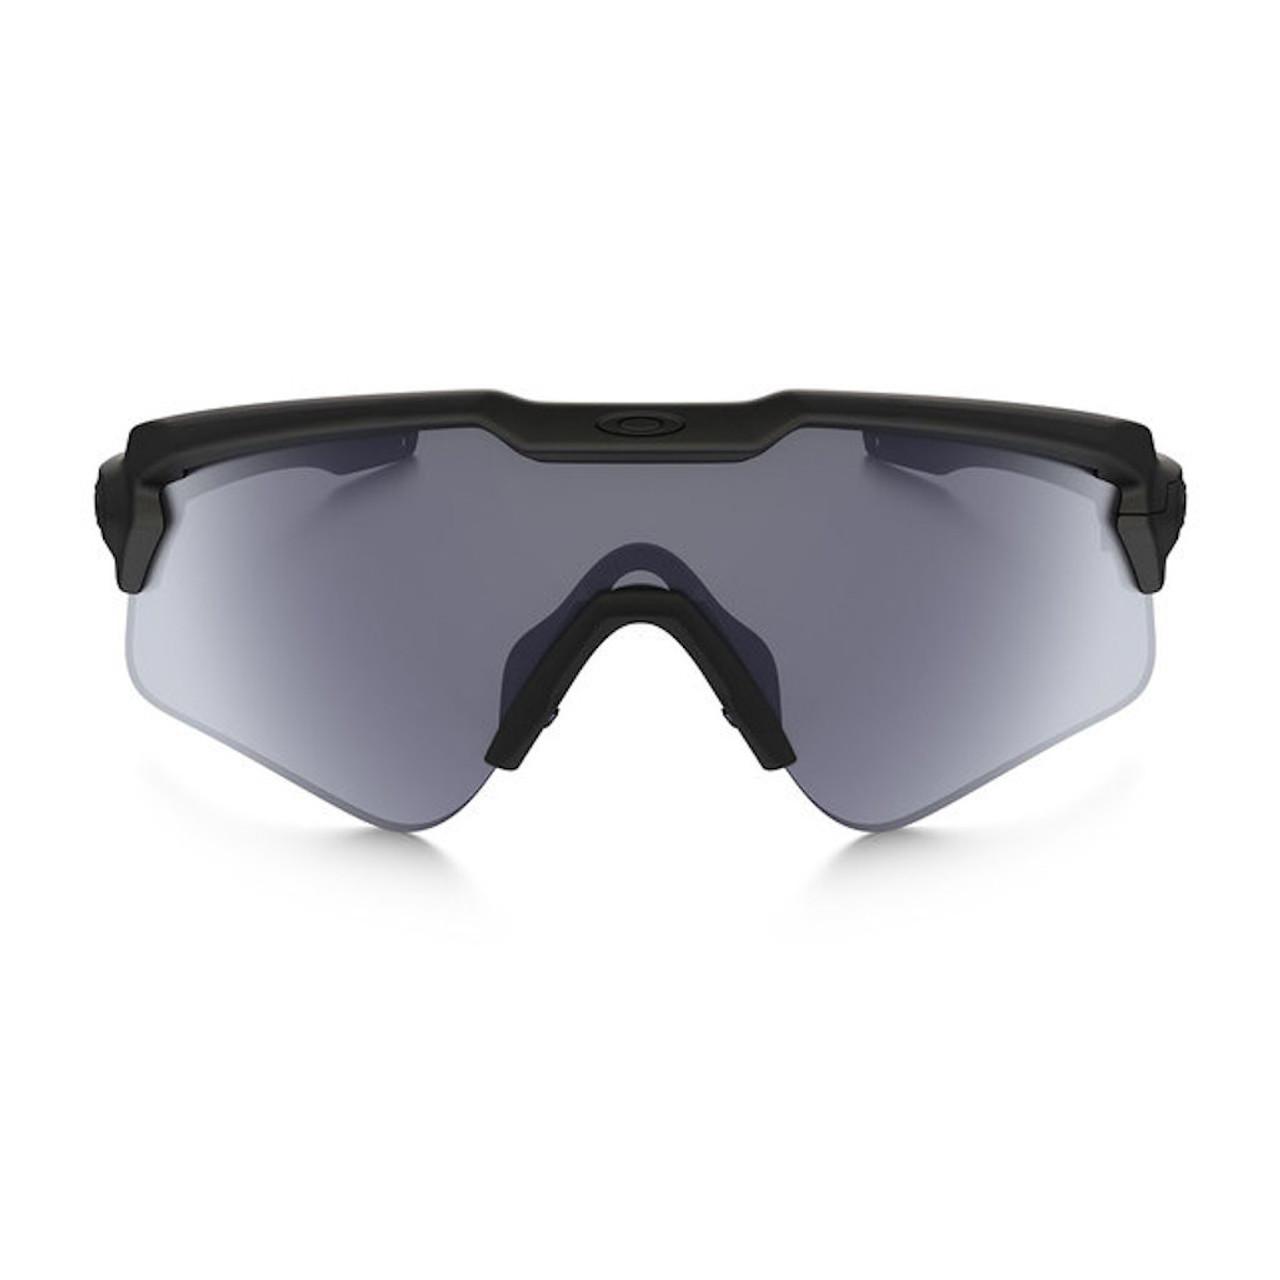 acc7a15ab0 ... Oakley SI Ballistic Alpha Matte Black M Frame Grey Lenses ...